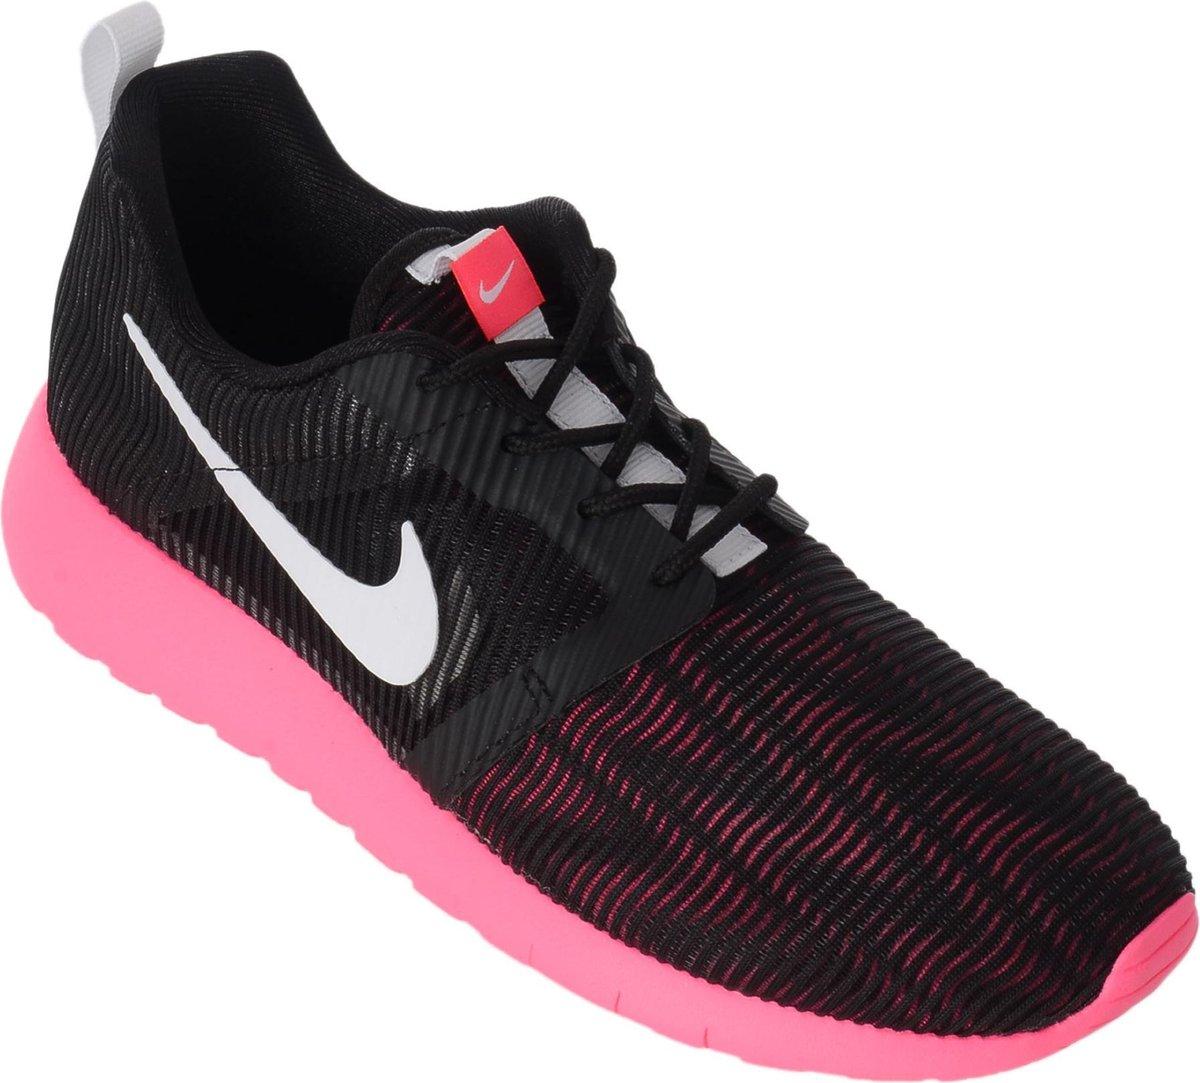   Nike Roshe One Flight Weight (GS) Sneakers Junior